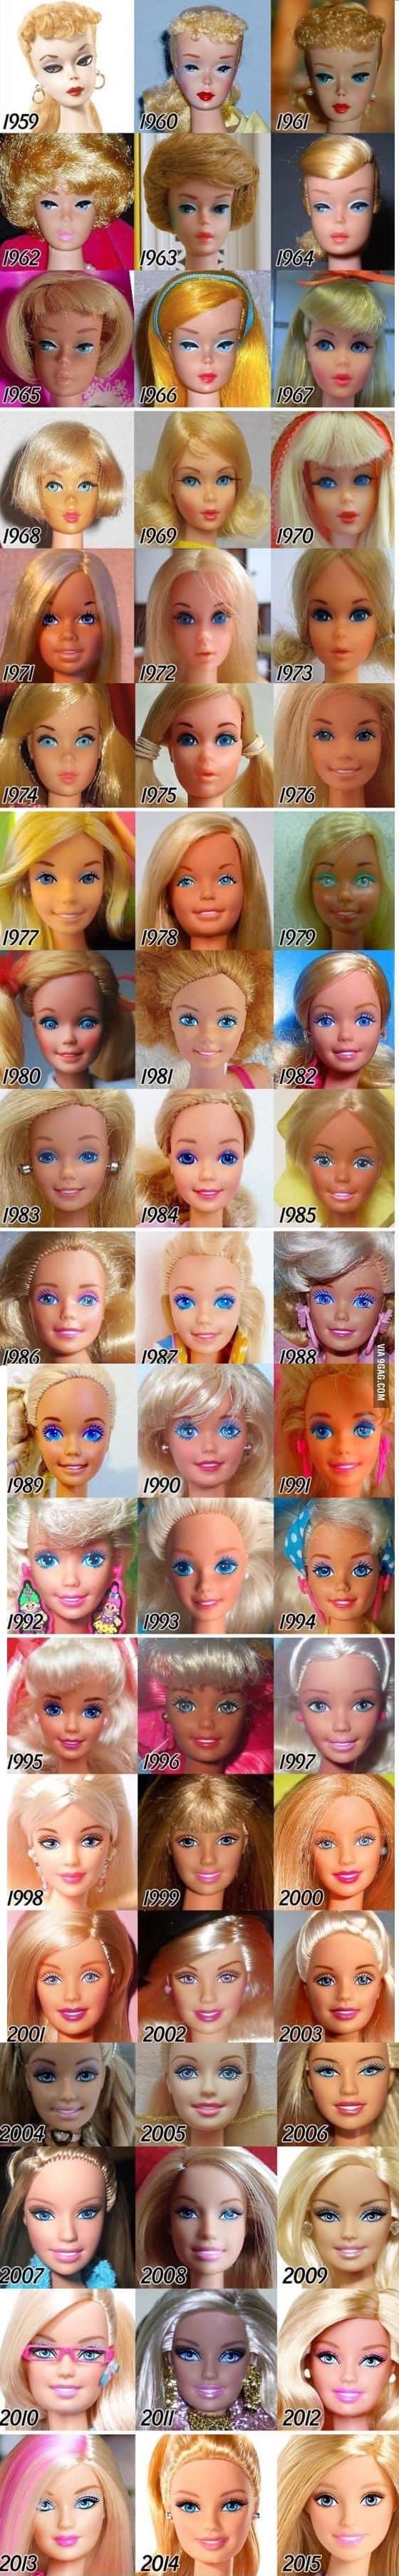 Эволюция Барби